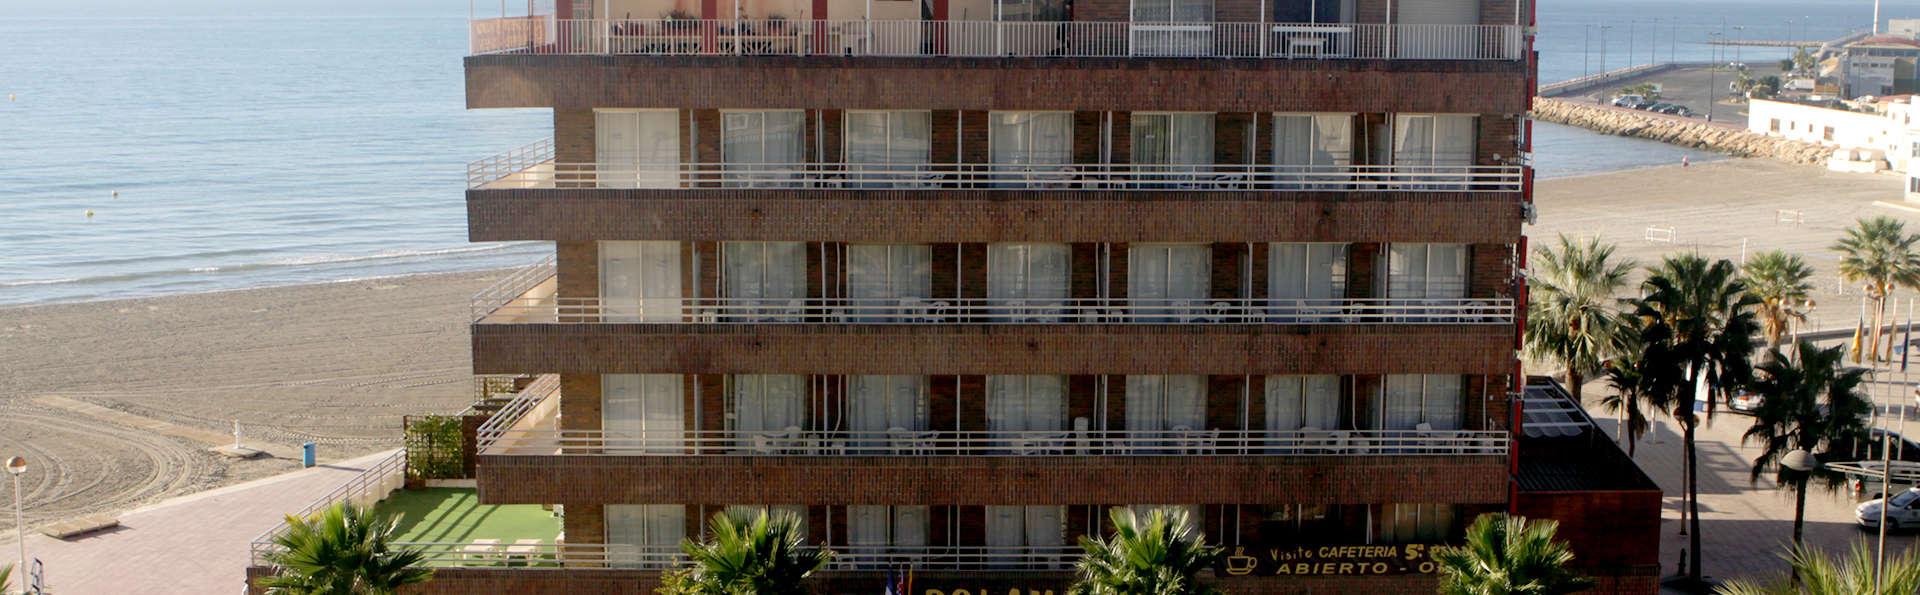 Hotel Restaurante Polamar - Edit_Front.jpg